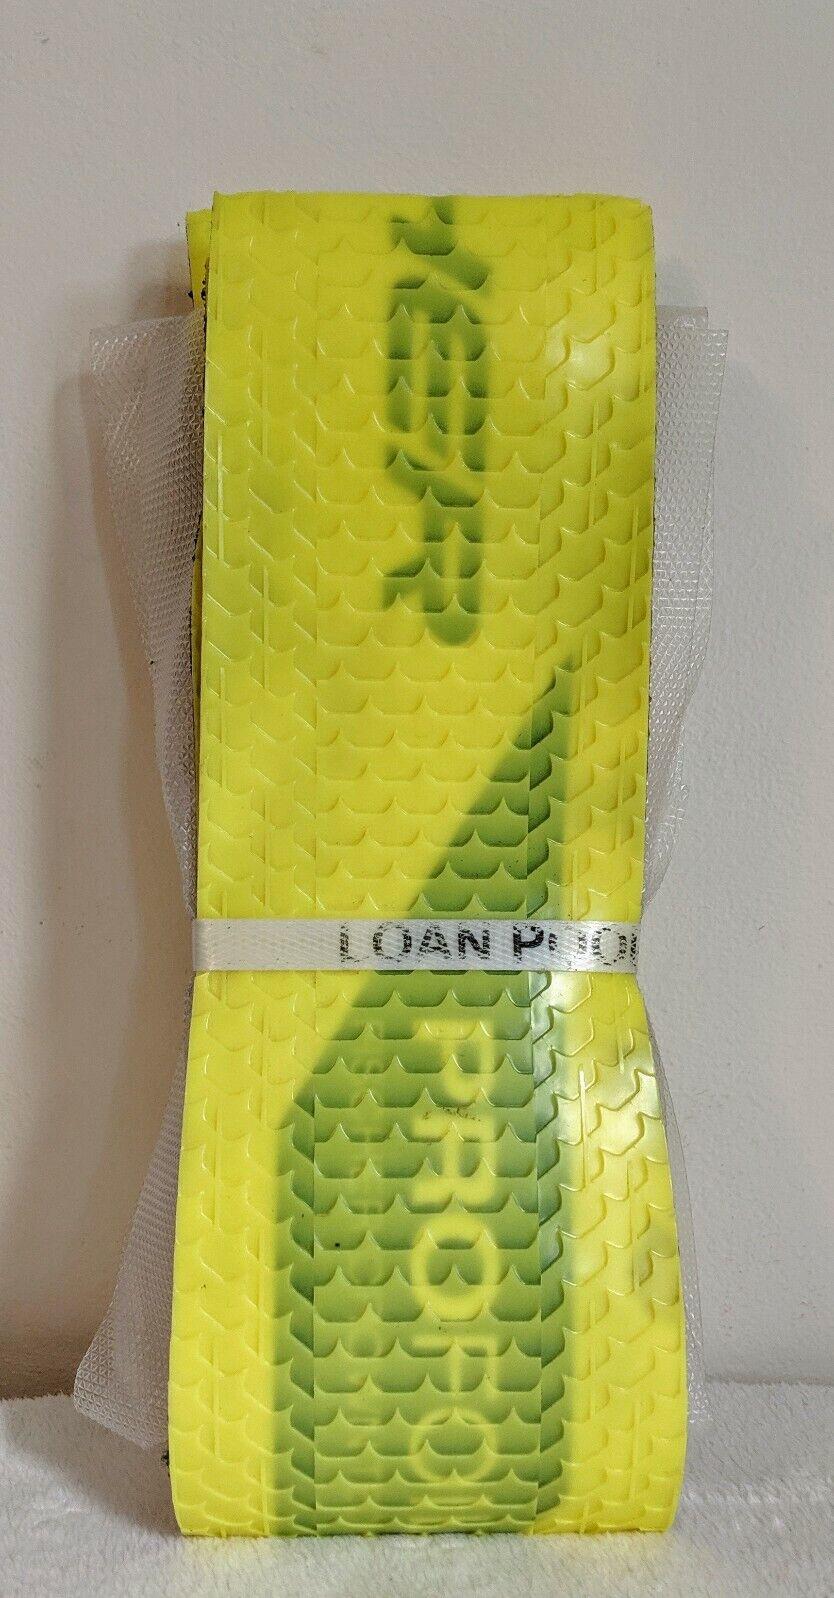 Profoil FISCHER Skins Multifit pre taglio fit 163cm  177cm